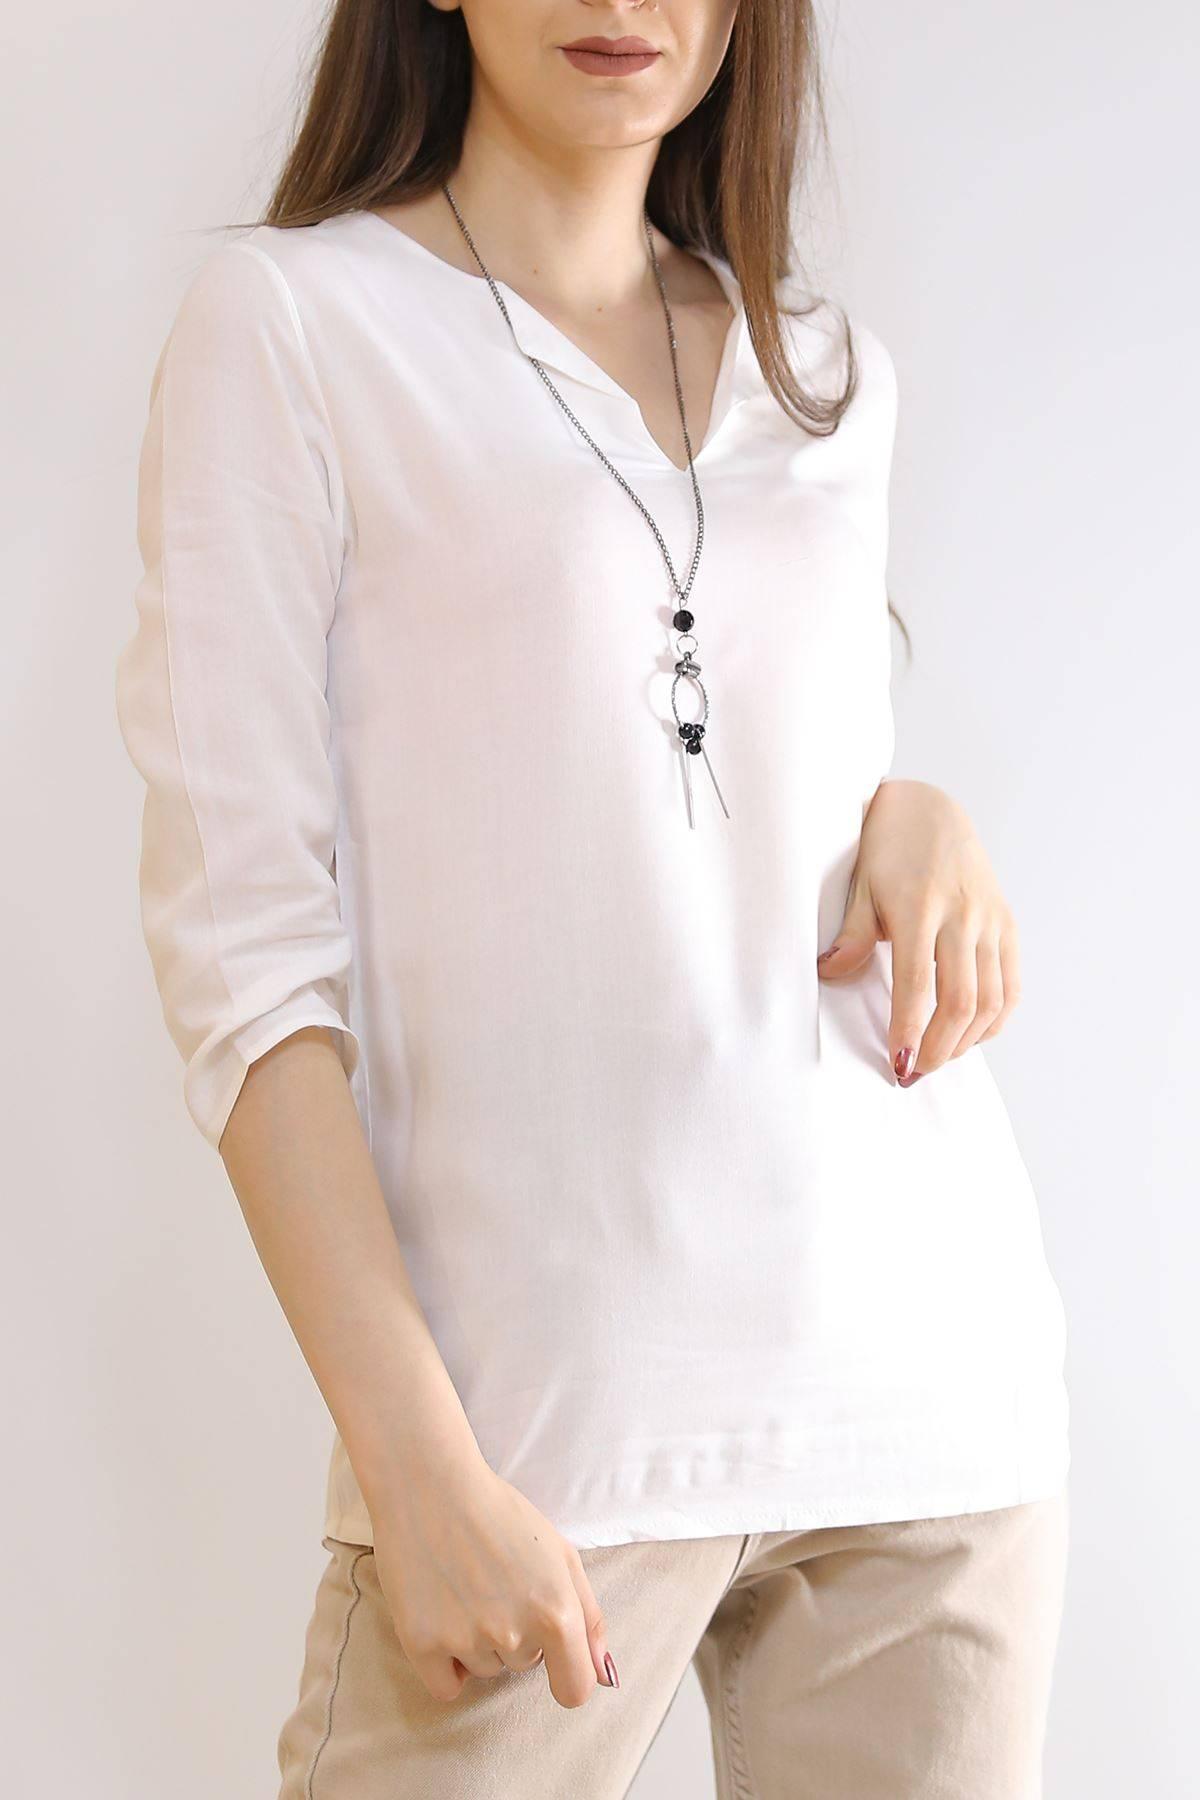 Kolyeli Bluz Beyaz - 6171.1059.